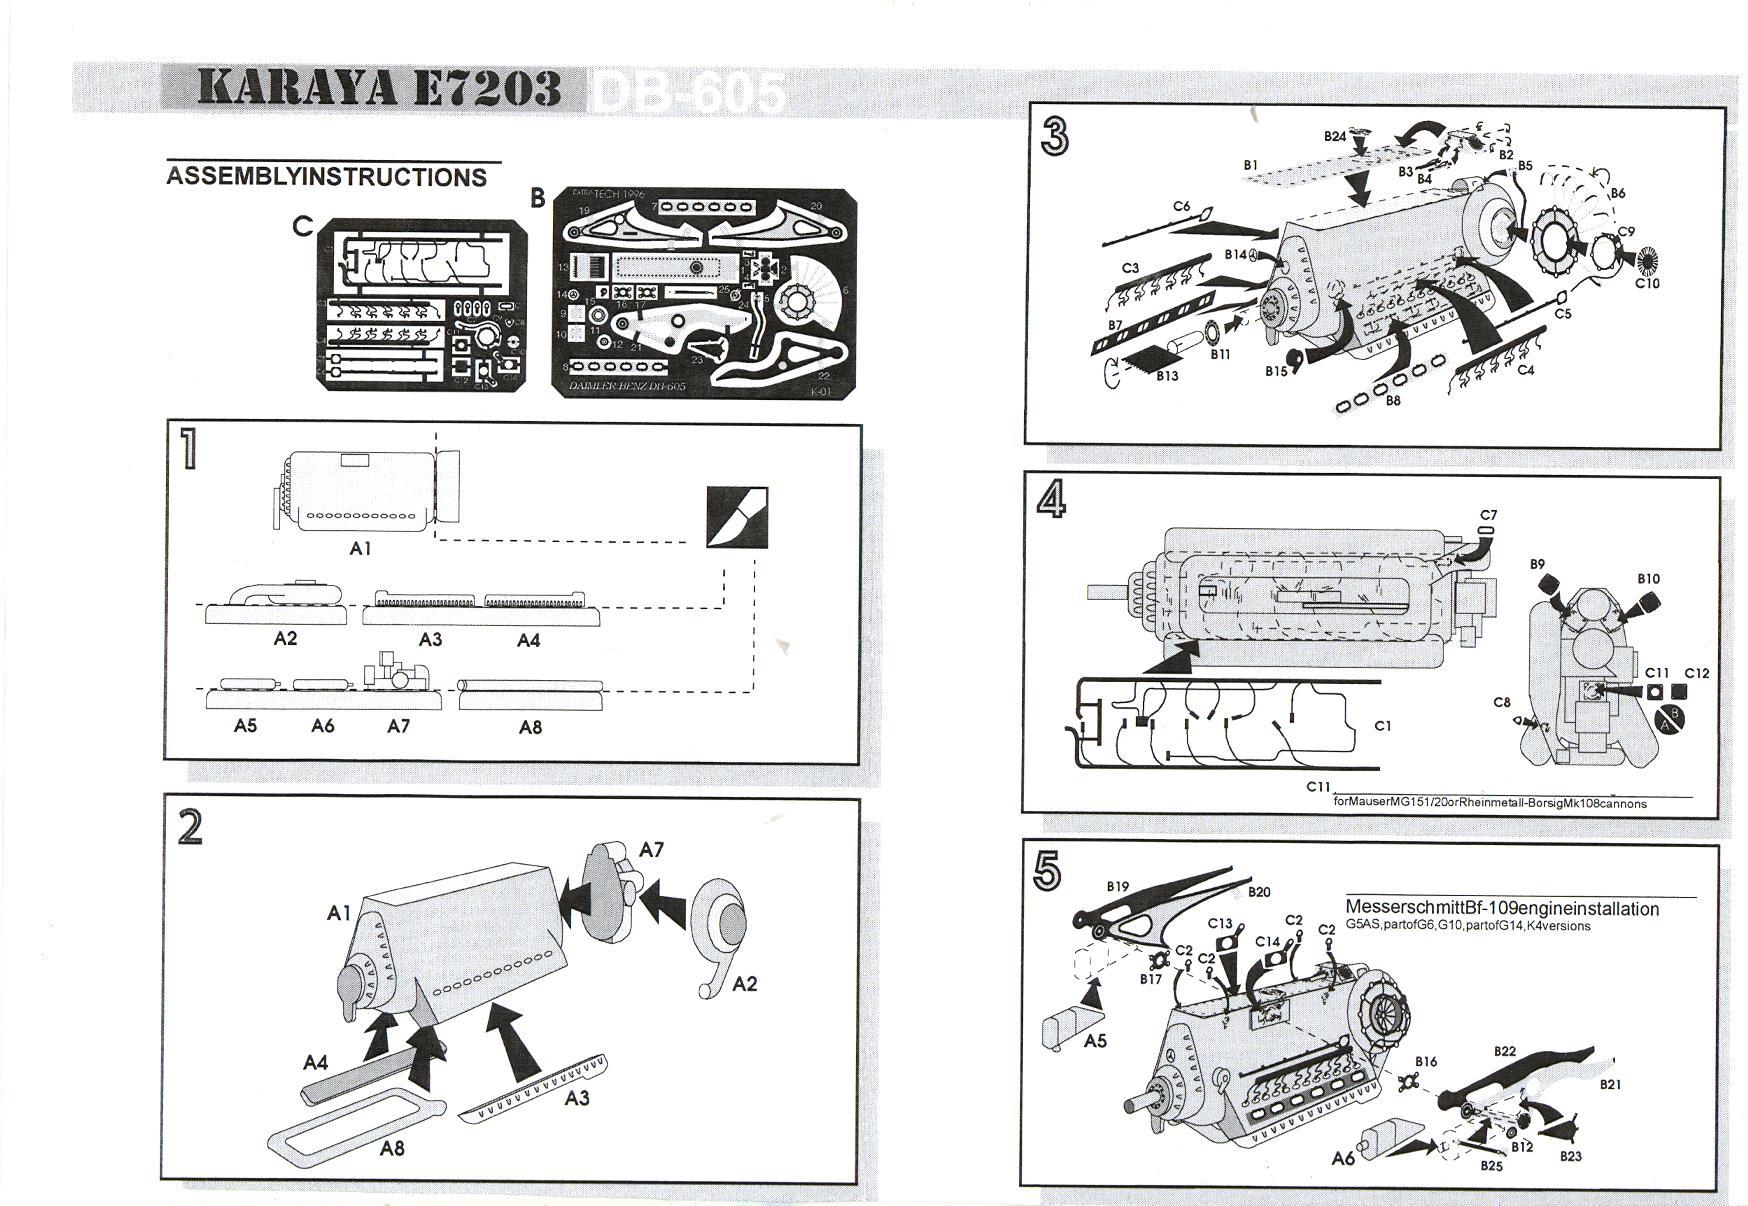 Karaya Models 1 72 Db 605 Aircraft Engine Resin Kit